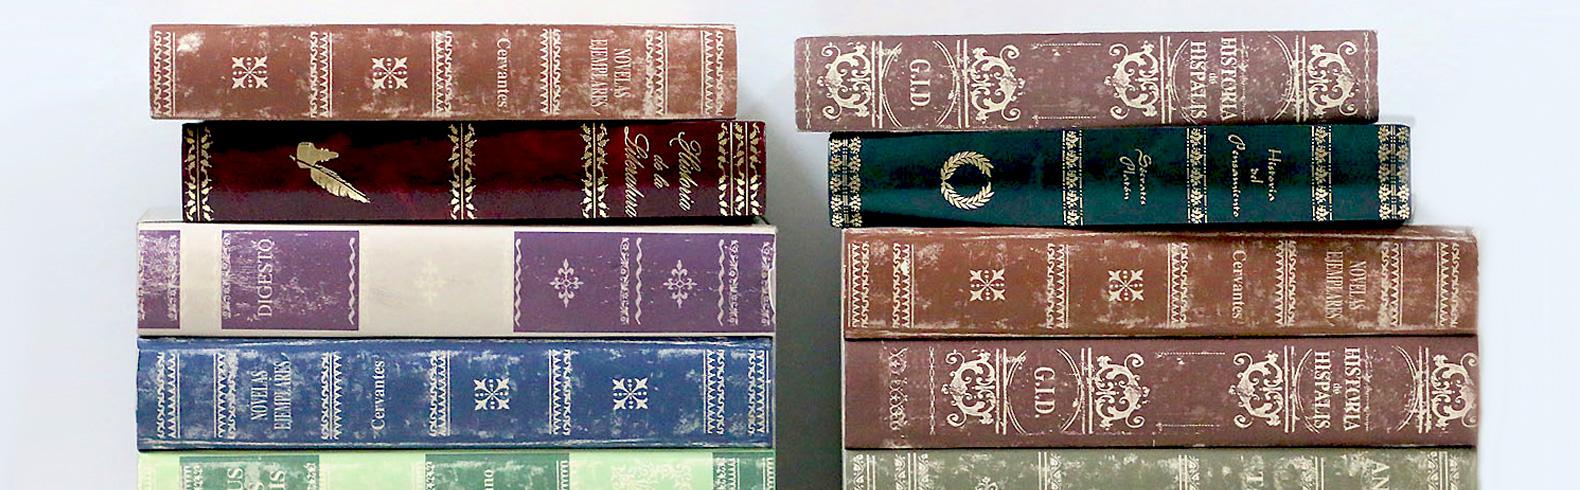 1.books